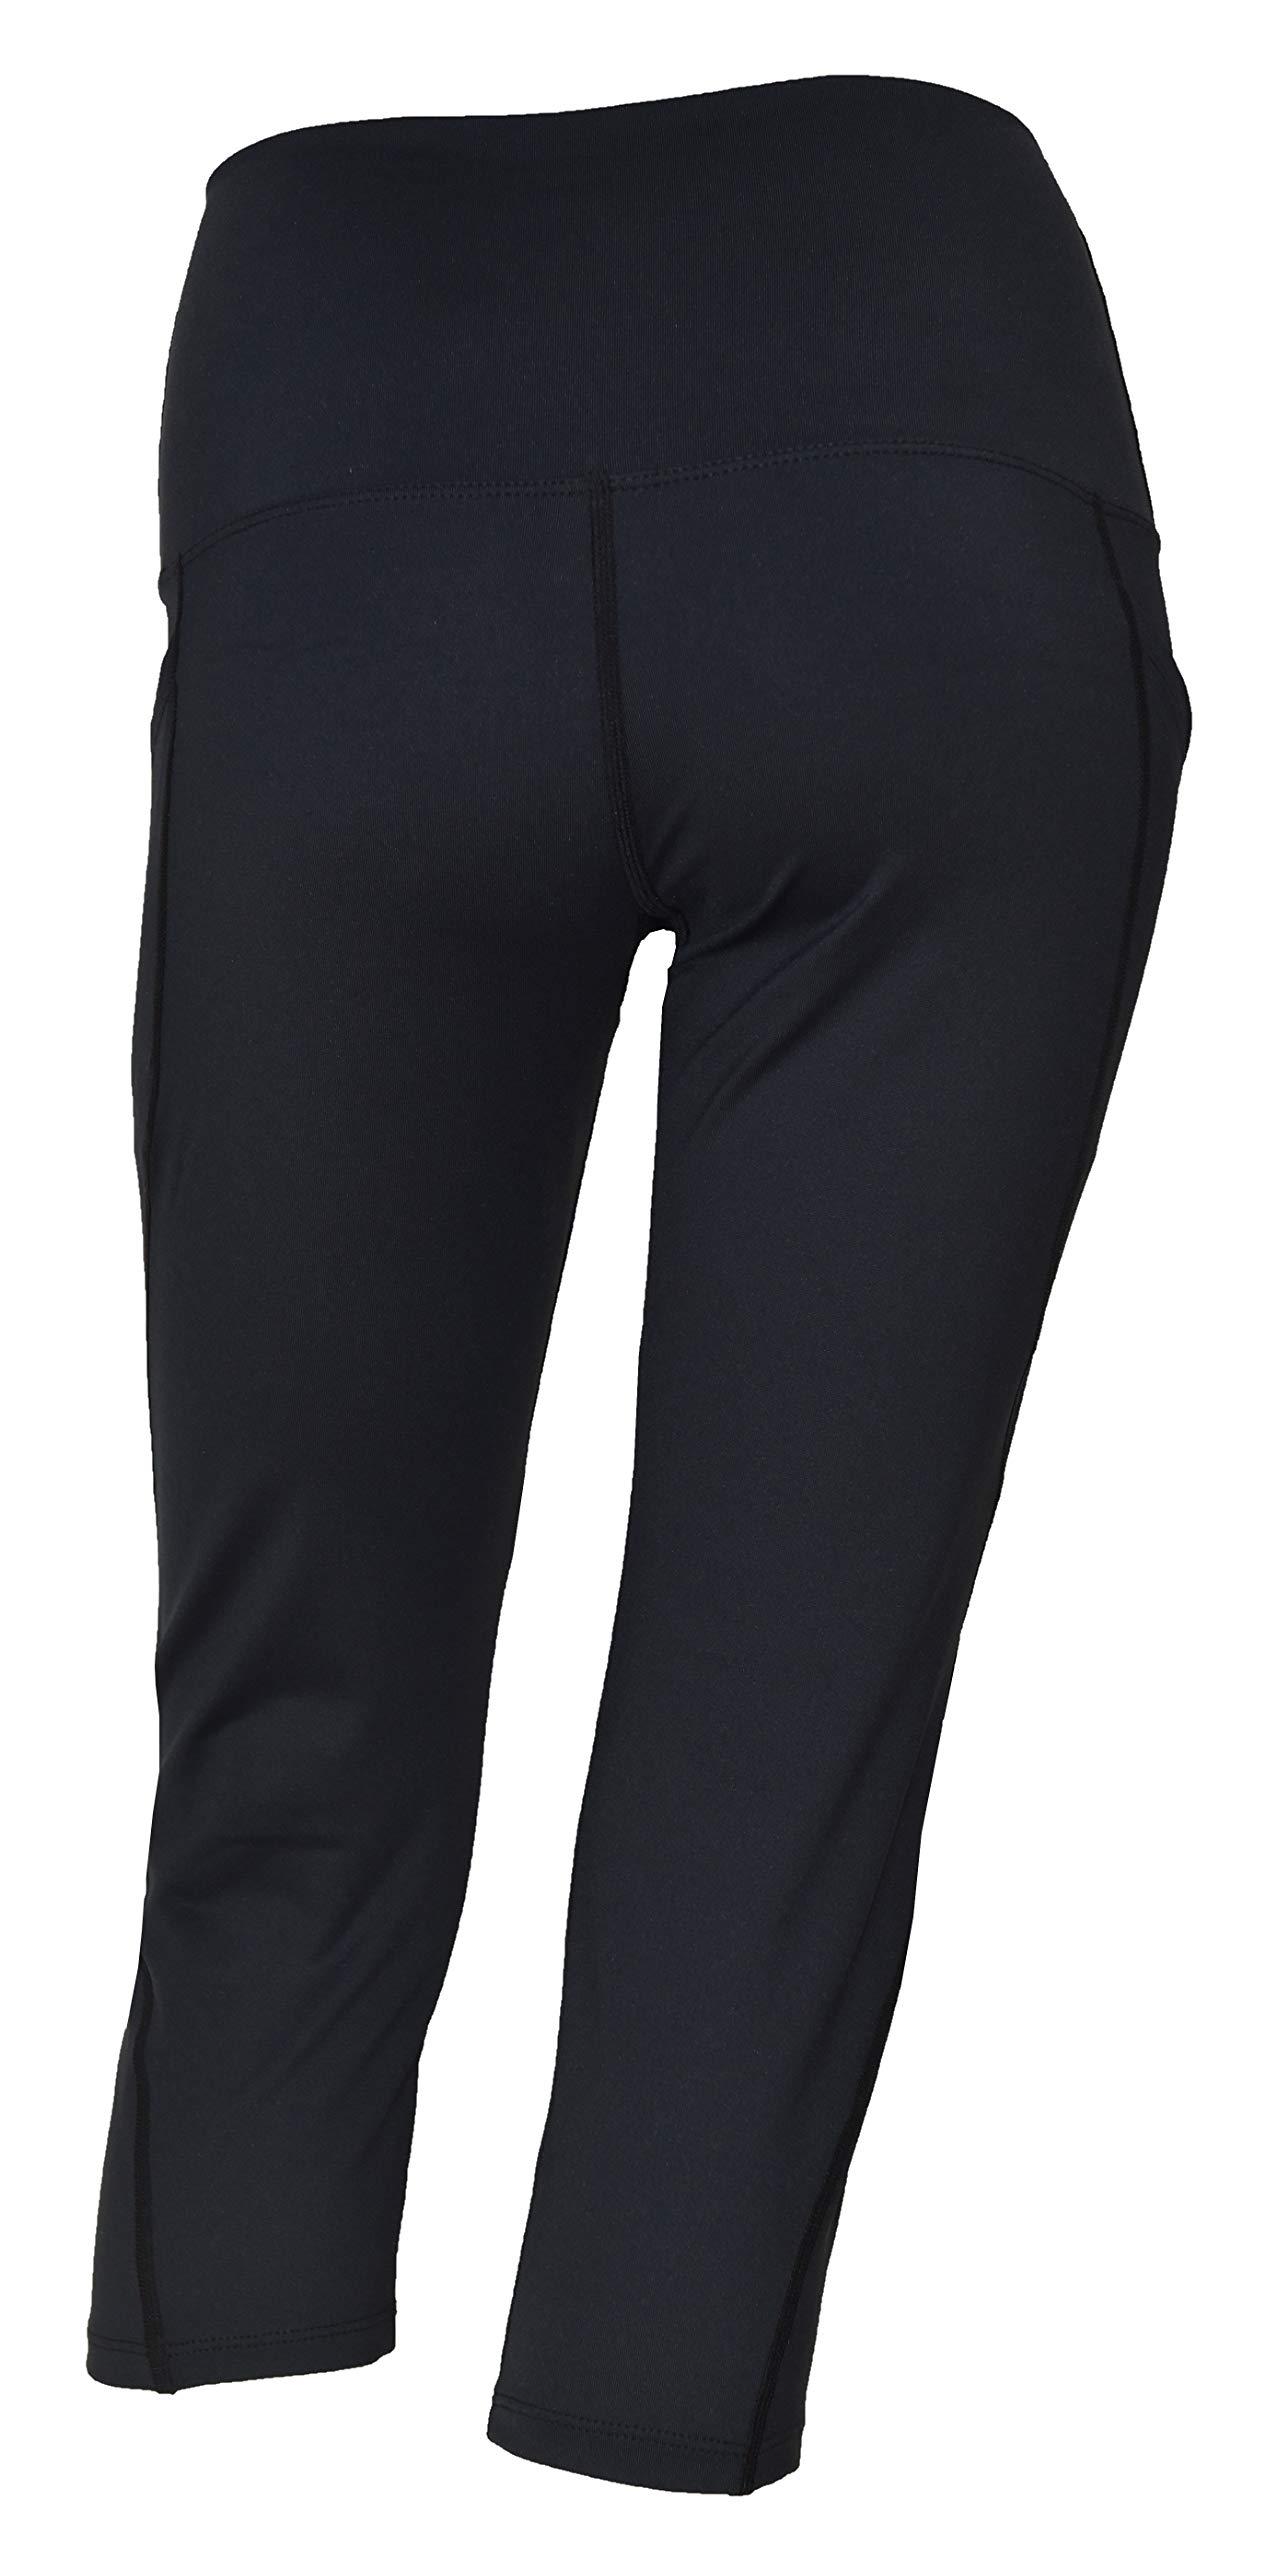 Private Island Women Swim Pockets Pants for UV Rashguard (Large, Black) by Private Island